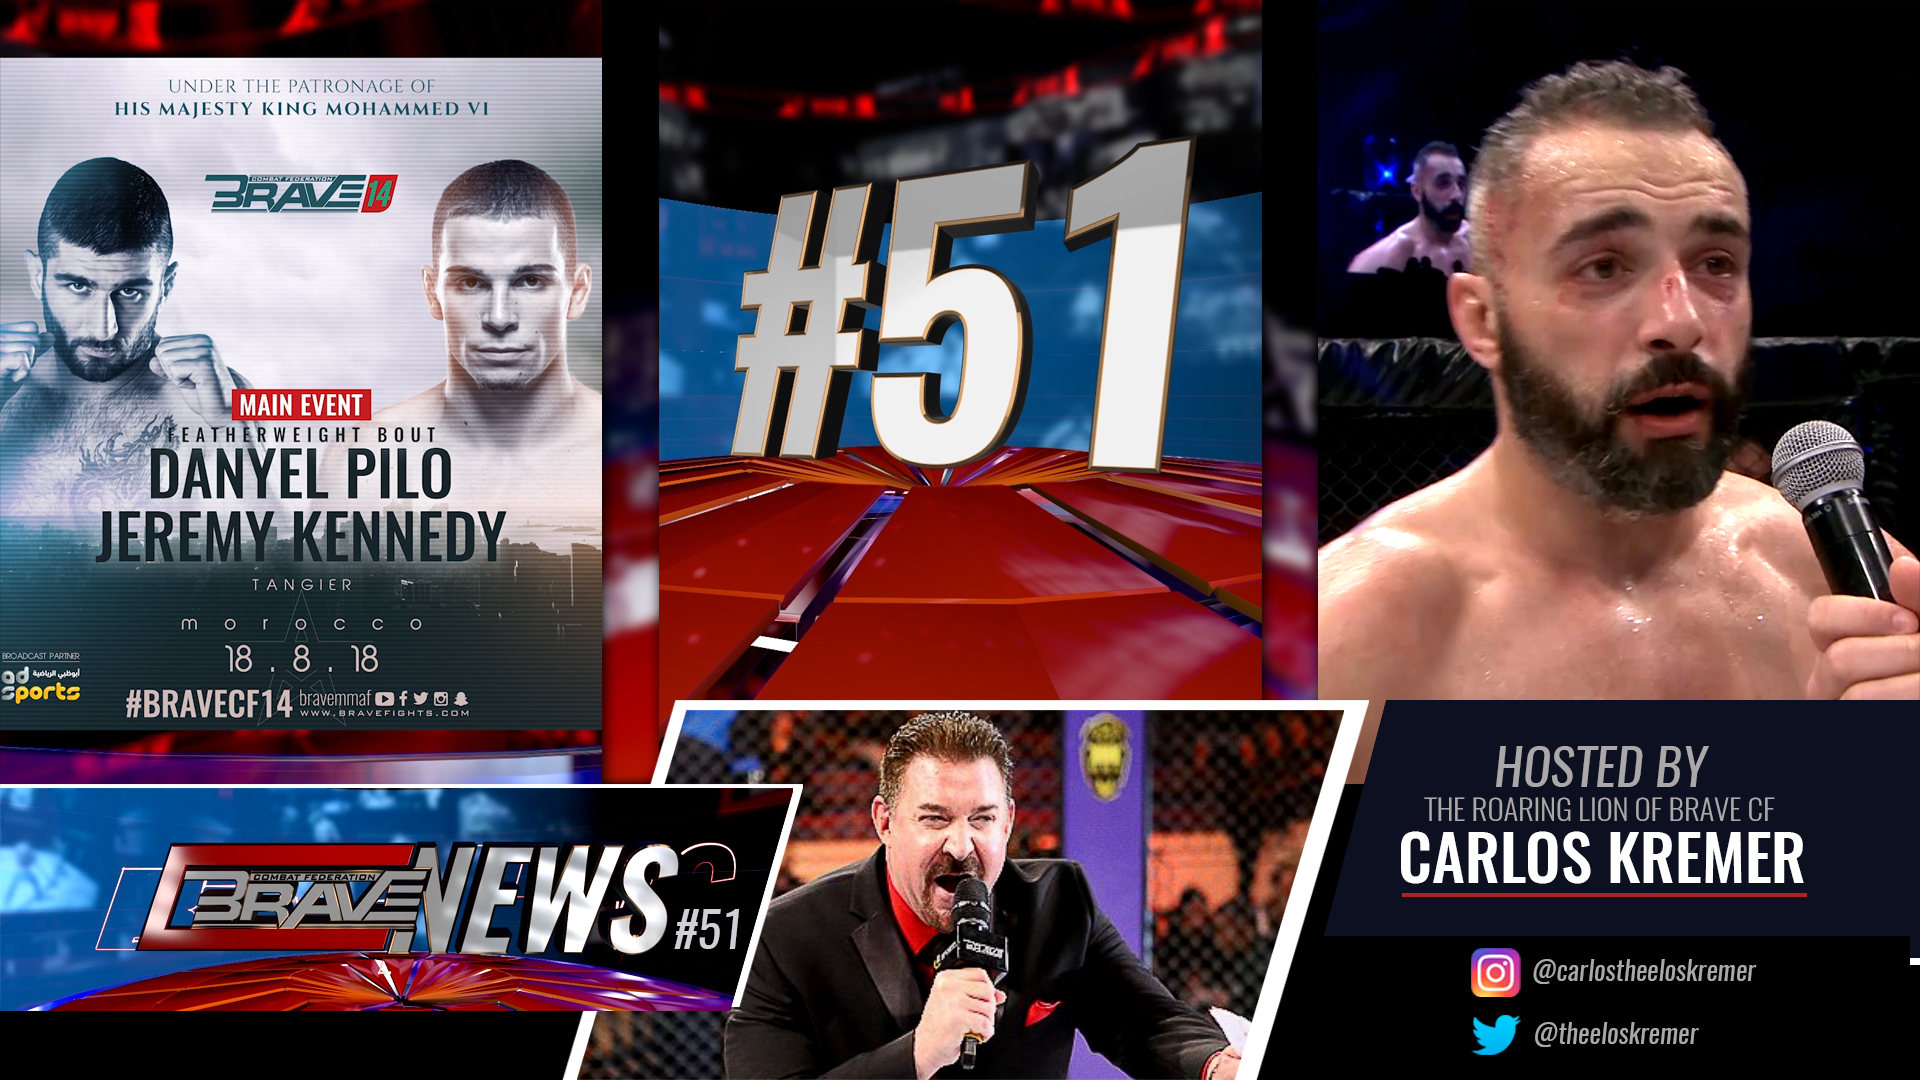 Brave News #51: New-look show announces Jeremy Kennedy on Brave 14 main event - Jeremy Kennedy